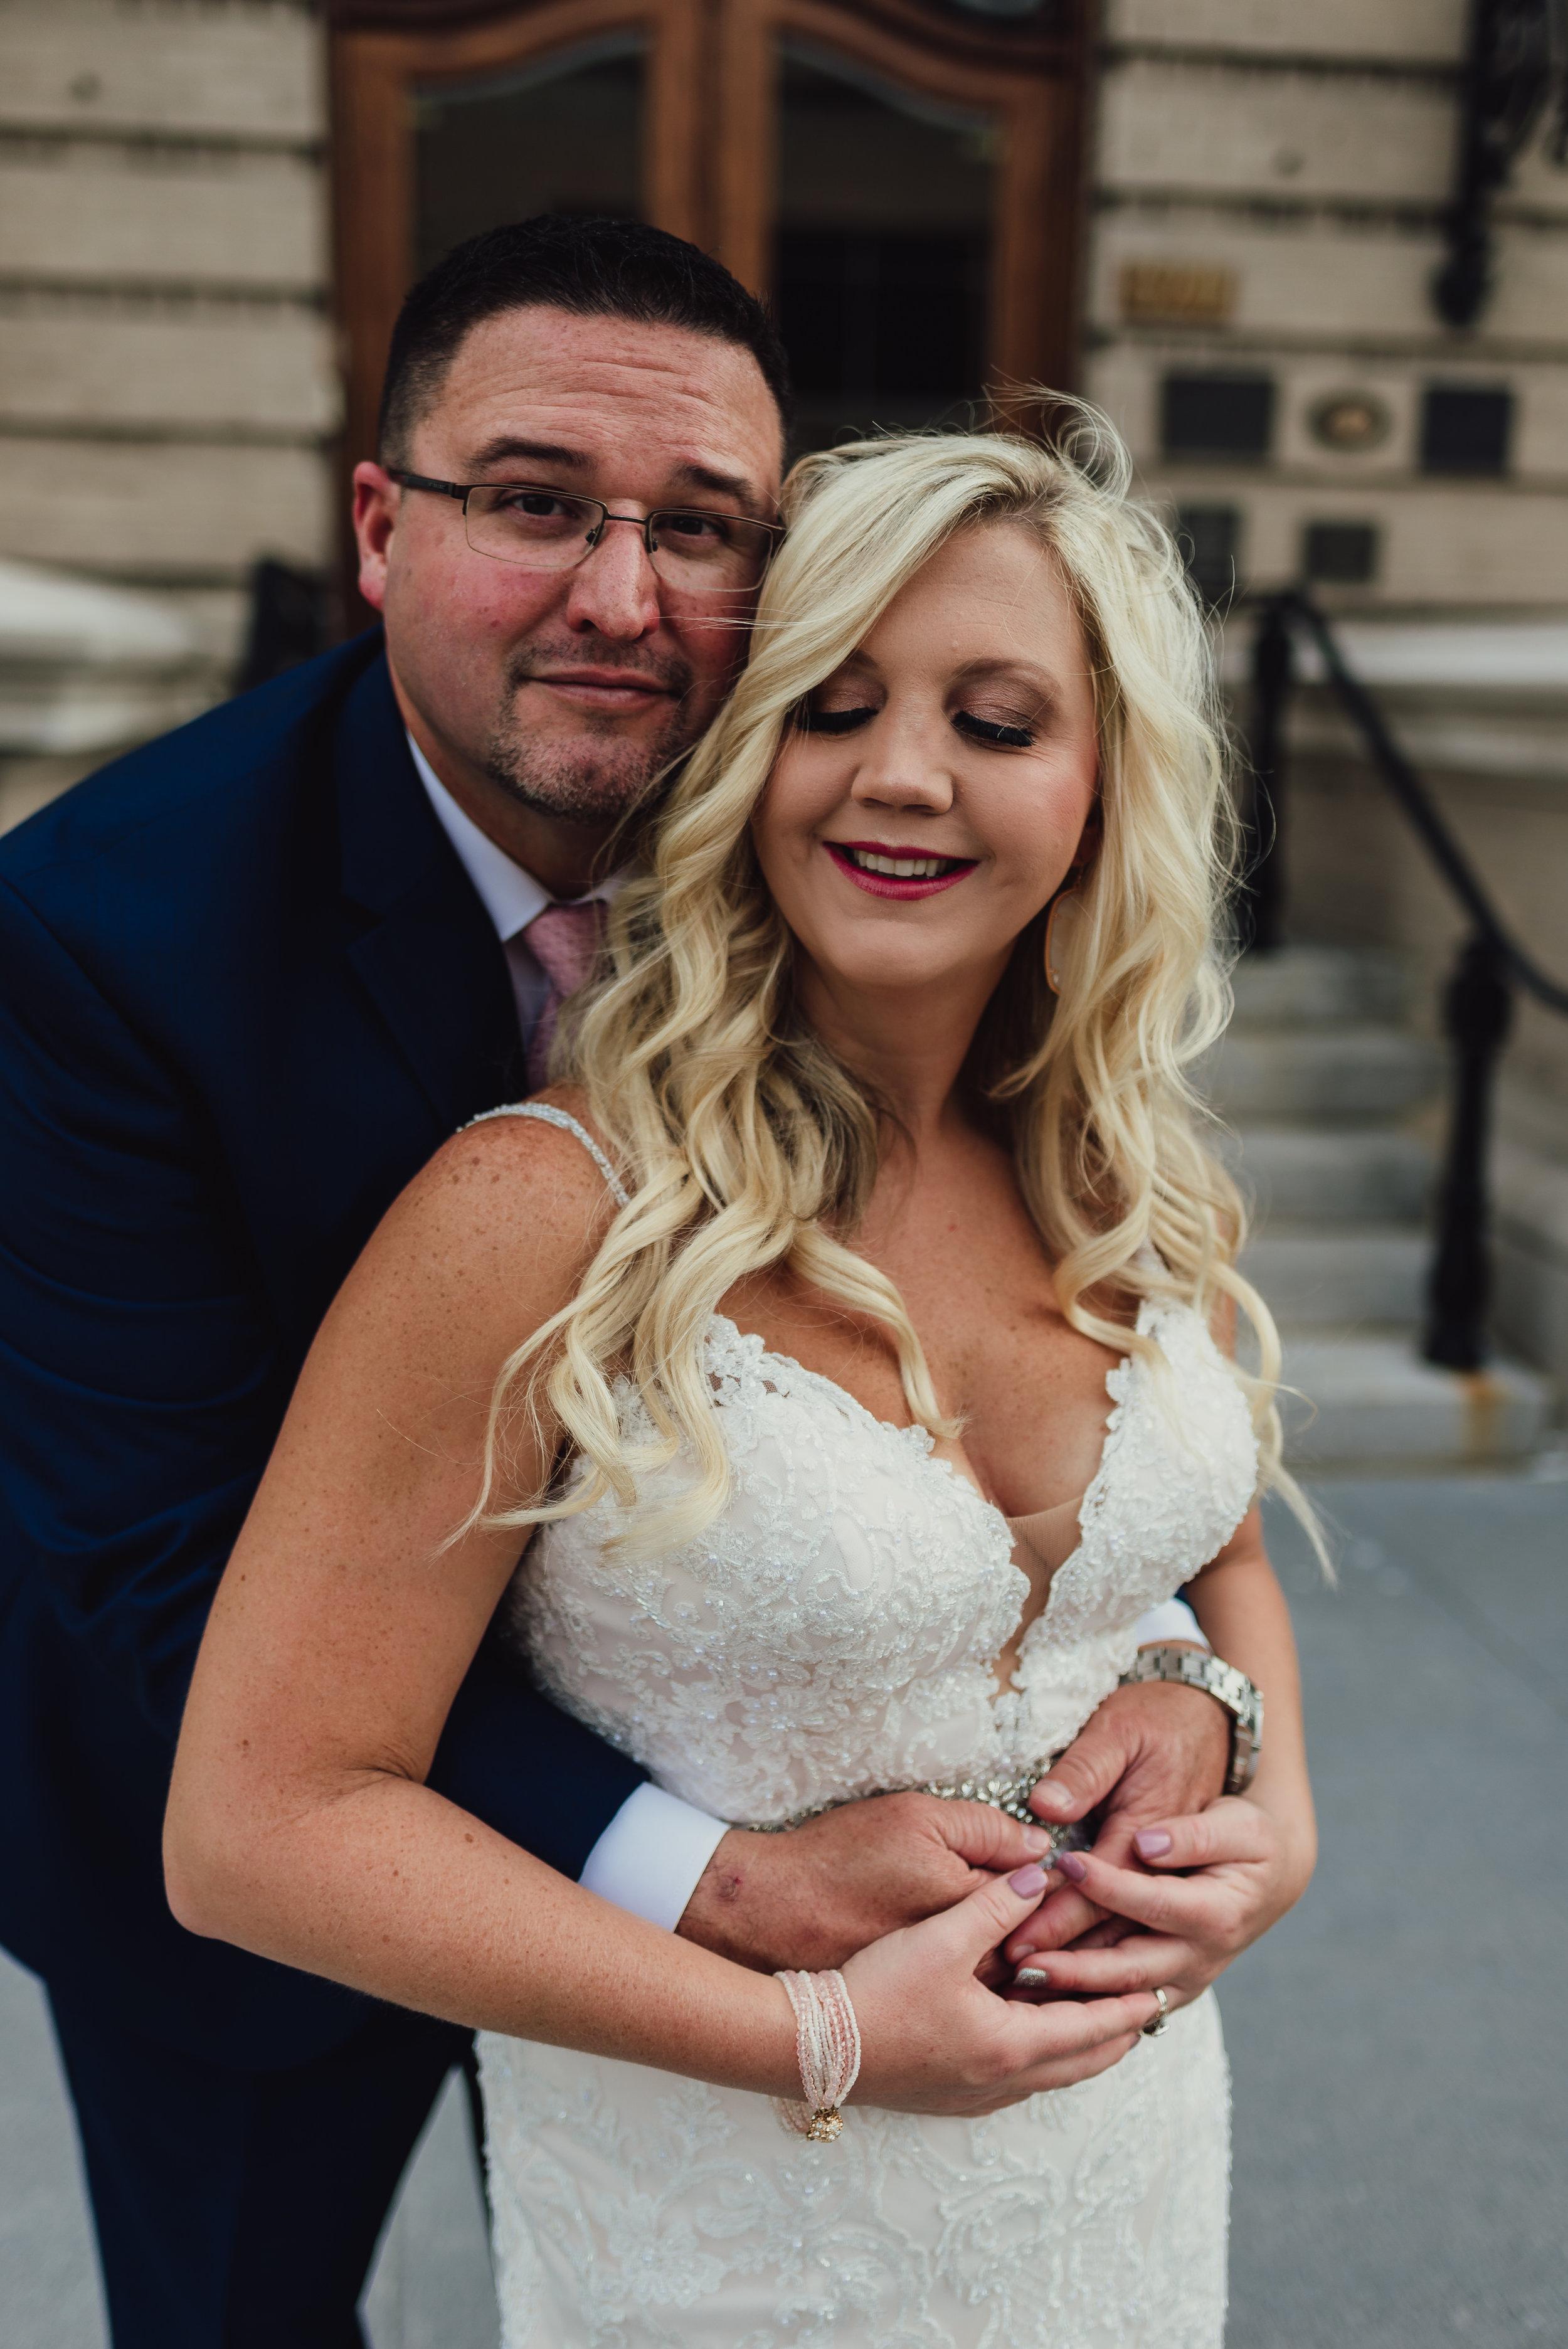 east-tn-wedding-photographer-tennessee-elopement-photographer-kingsport-tn-wedding-photographer (270 of 1001).jpg